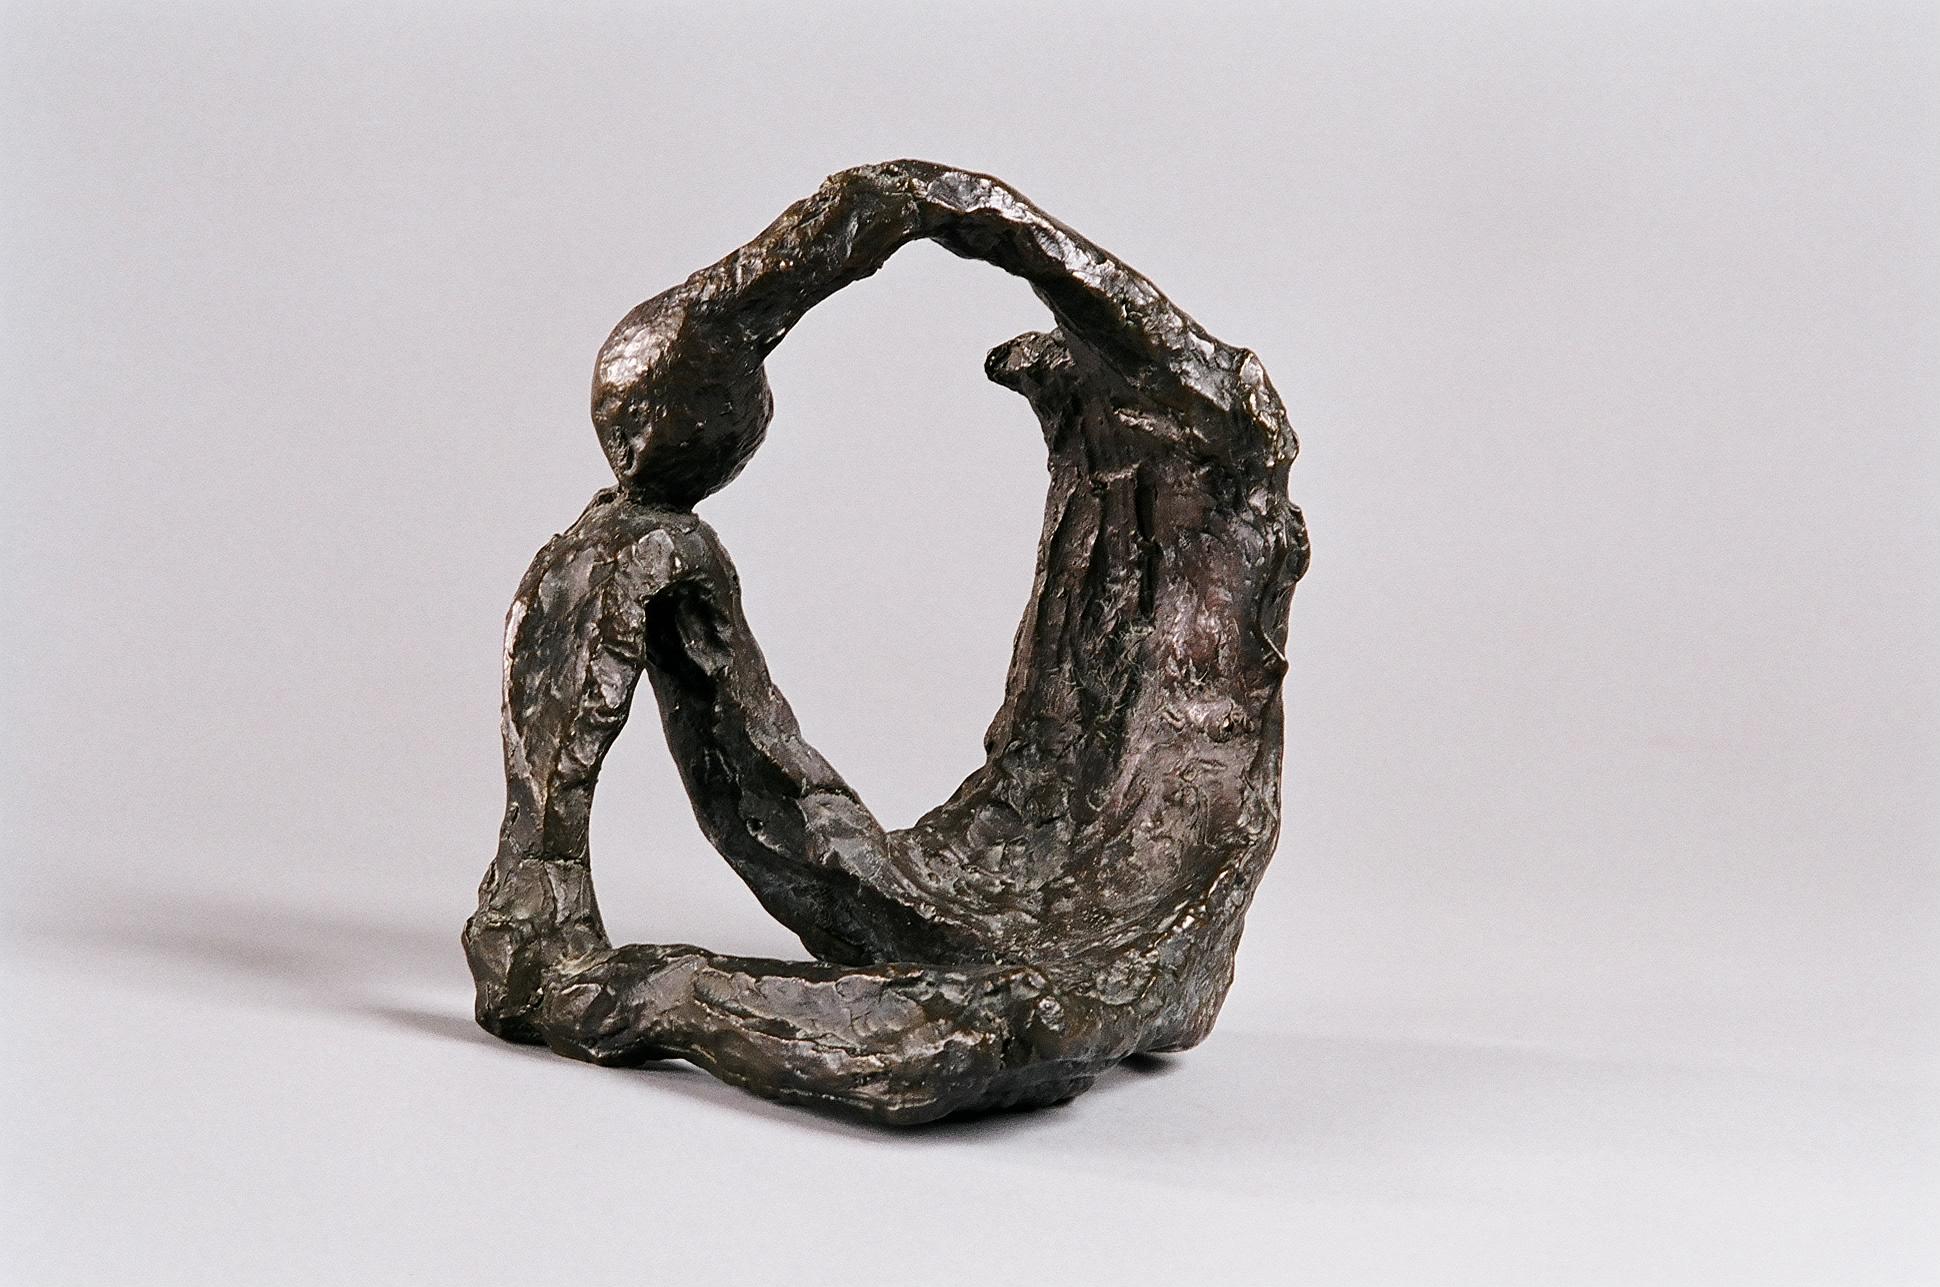 yizkor-16x13x14cm-bronze